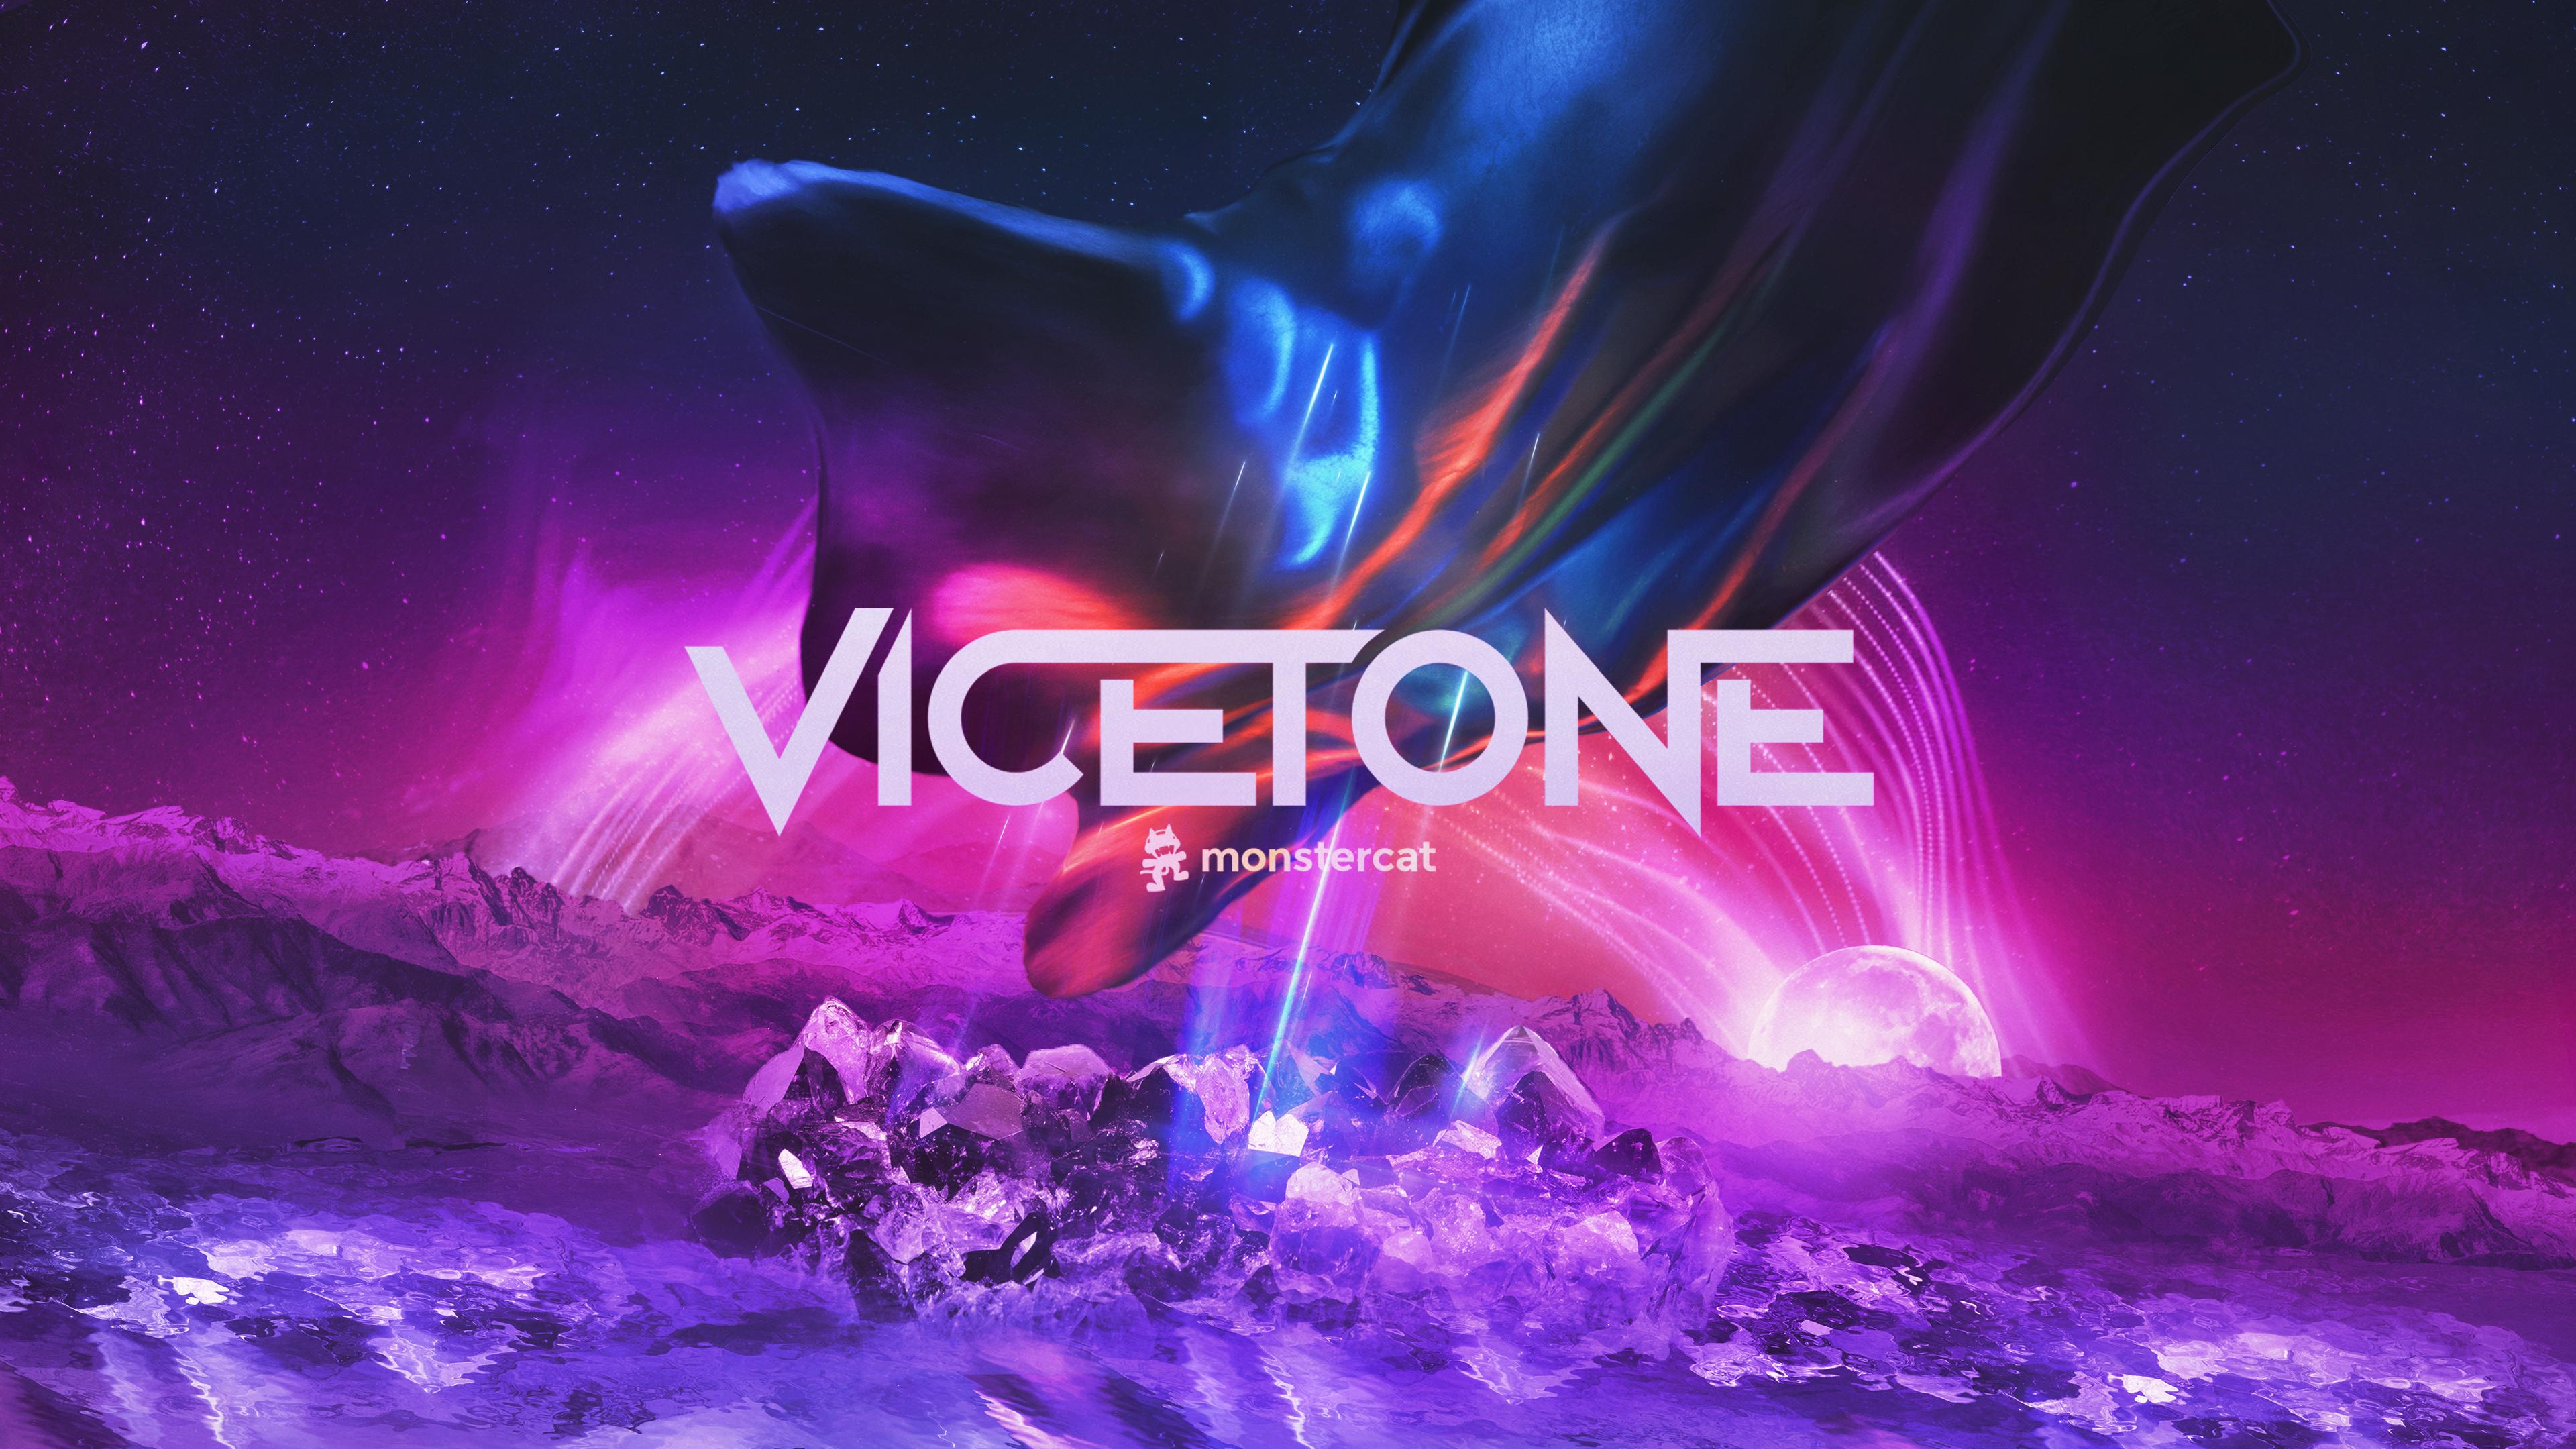 Vicetone Monstercat Music EDM Avicii House Elements 3840x2160